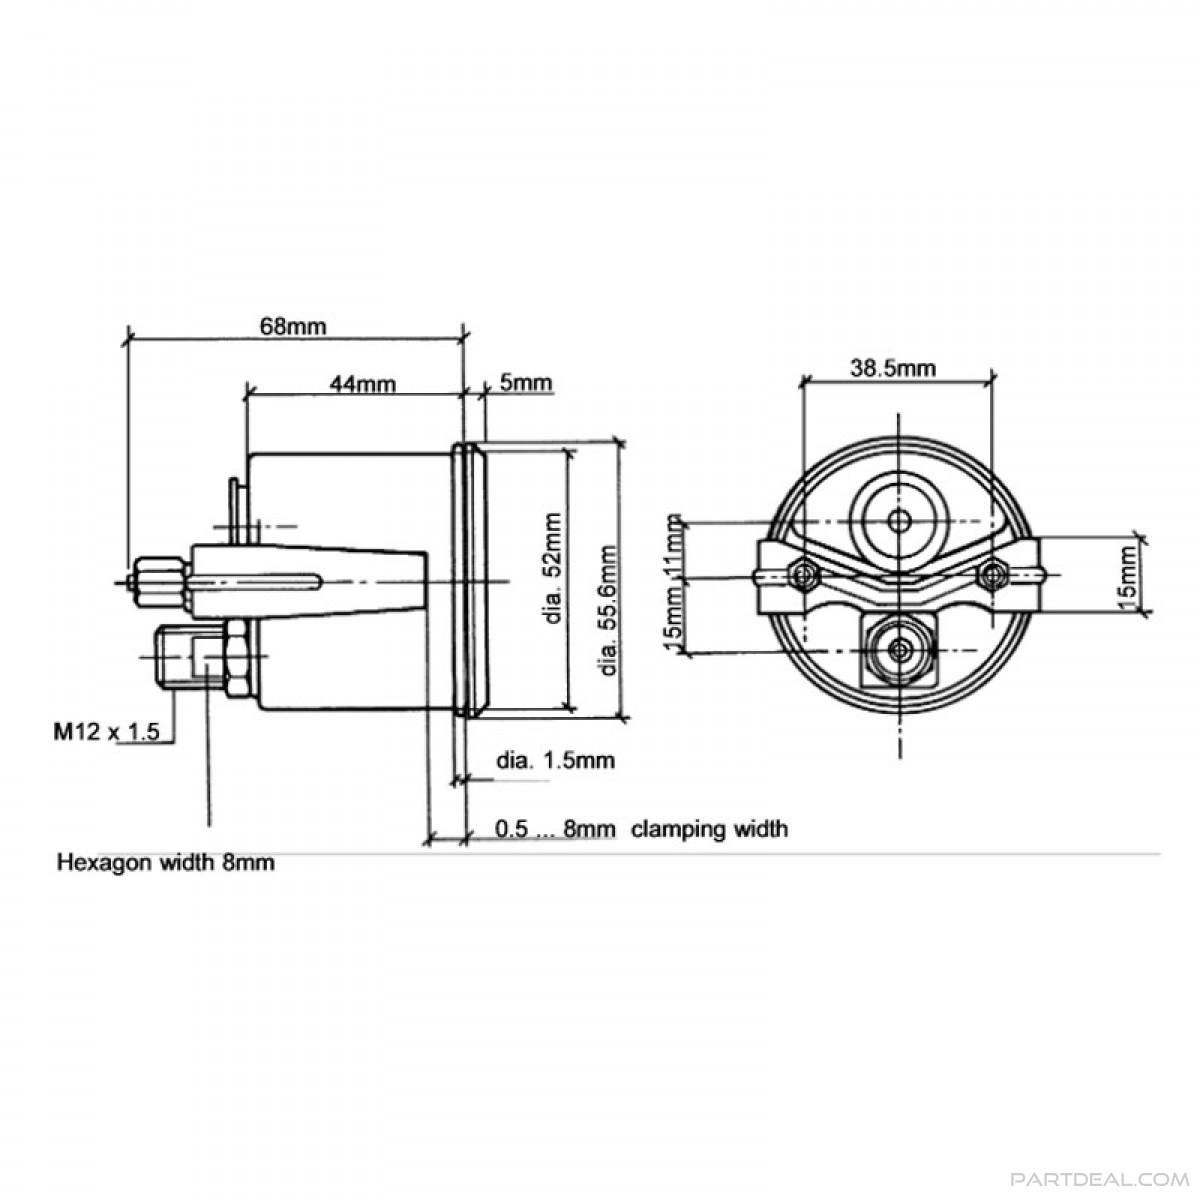 Vdo Rpm Gauge Wiring Diagram As Well Mechanical